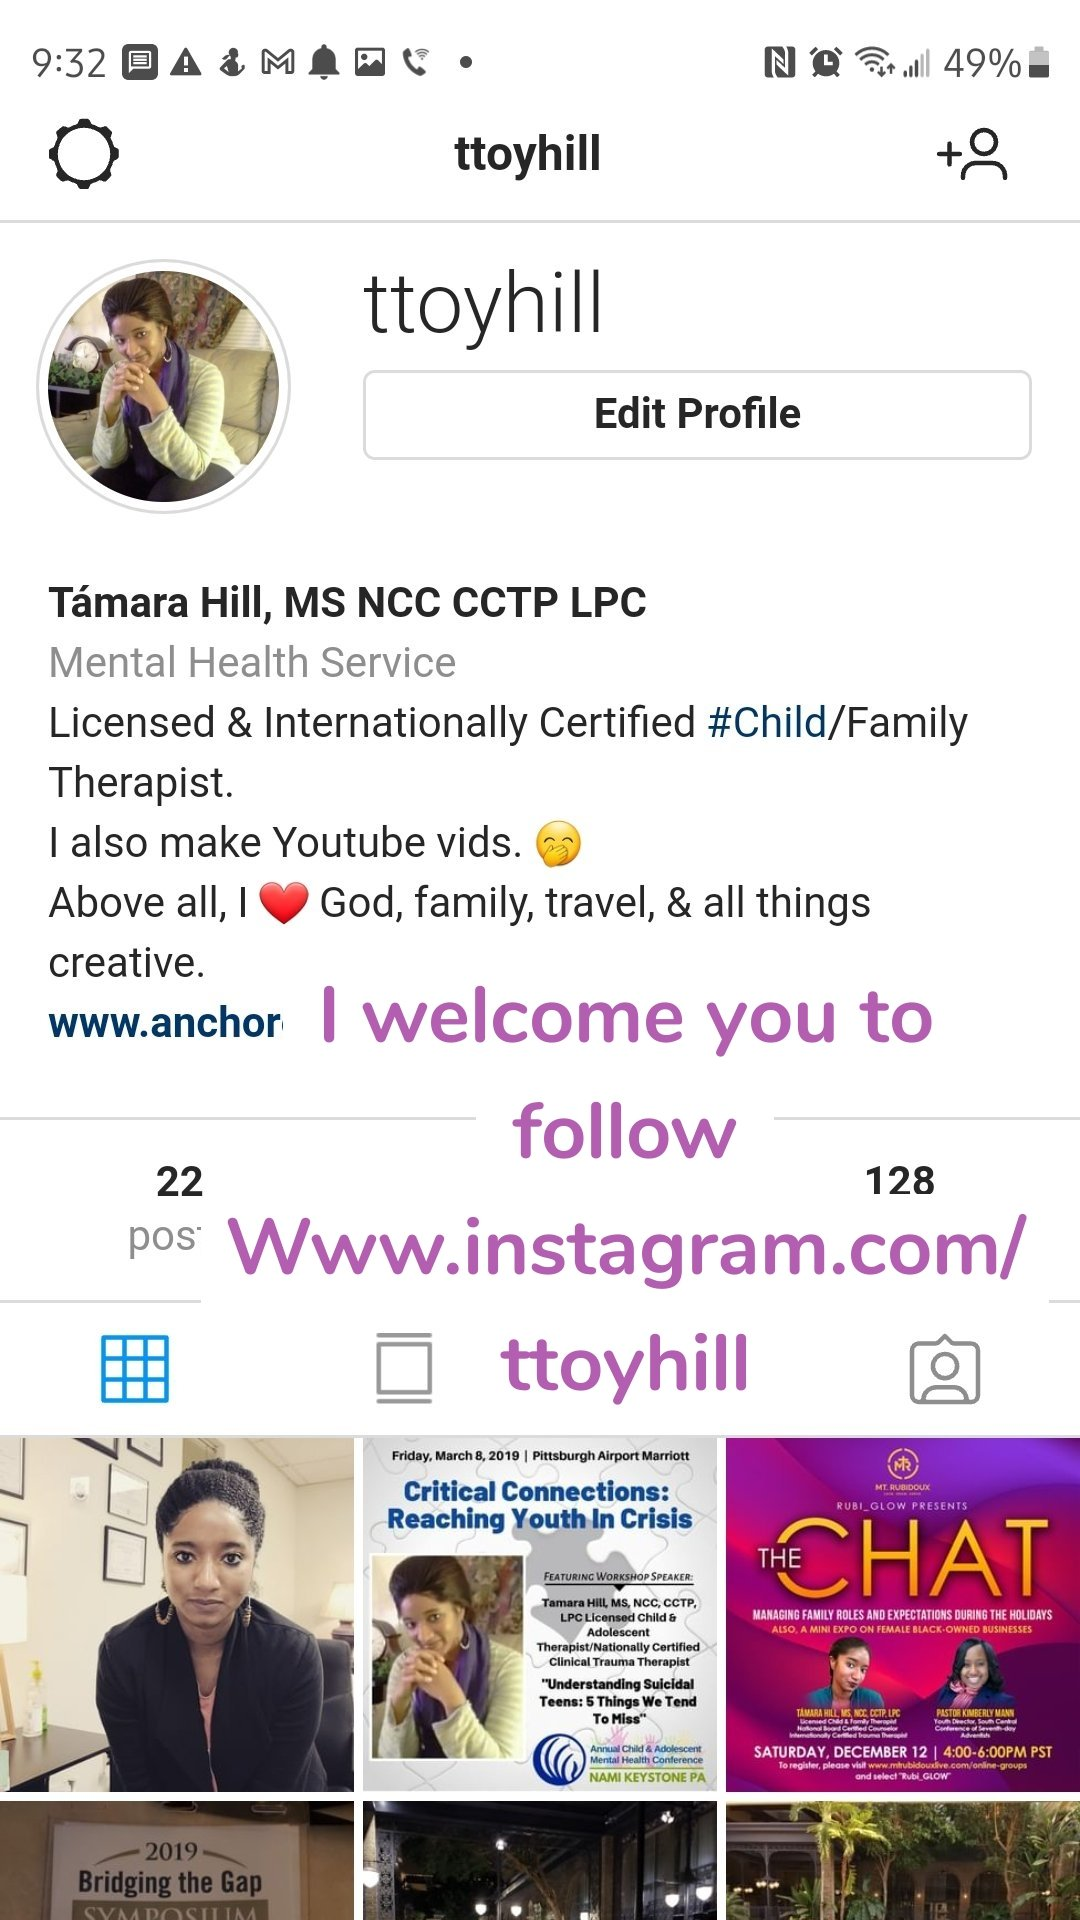 I welcome you to follow Www.instagram.com/ttoyhill